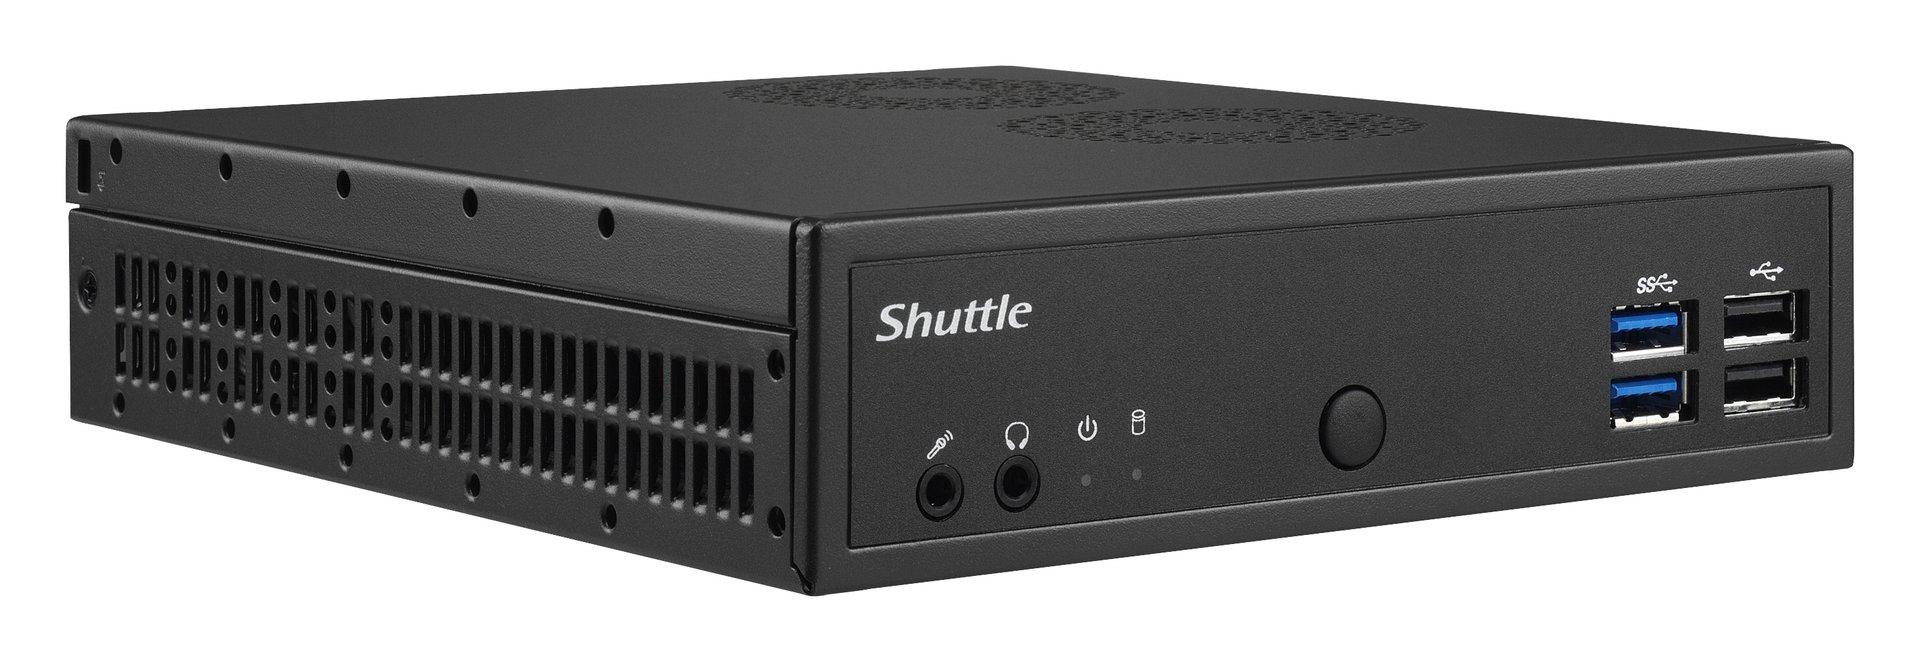 Shuttle XPC slim DH02U(5)